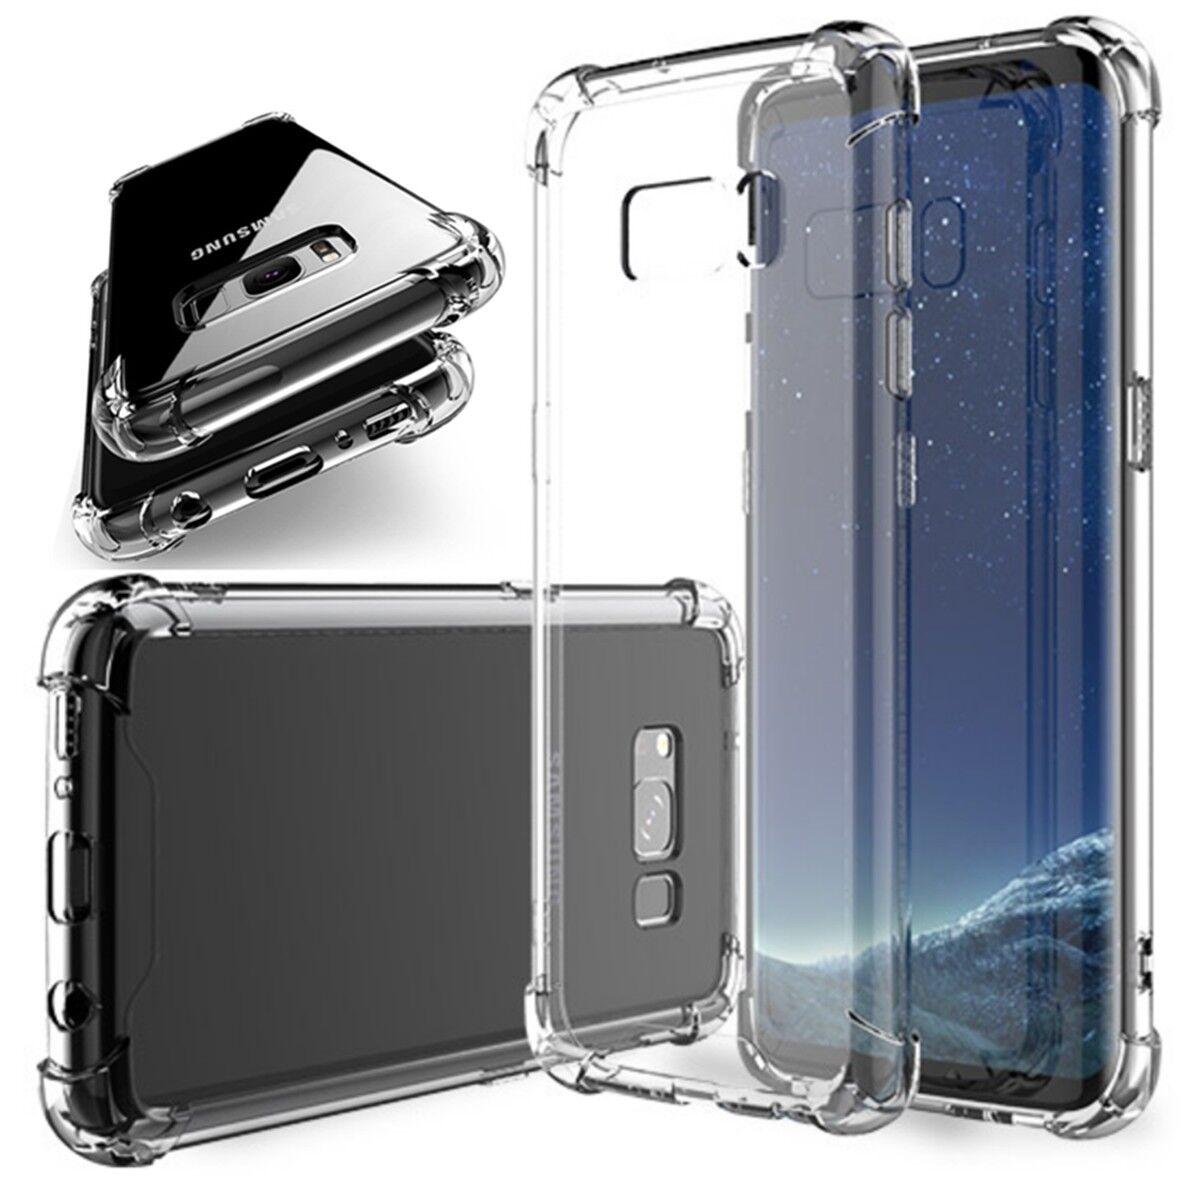 shockproof clear tpu bumper case fits galaxy